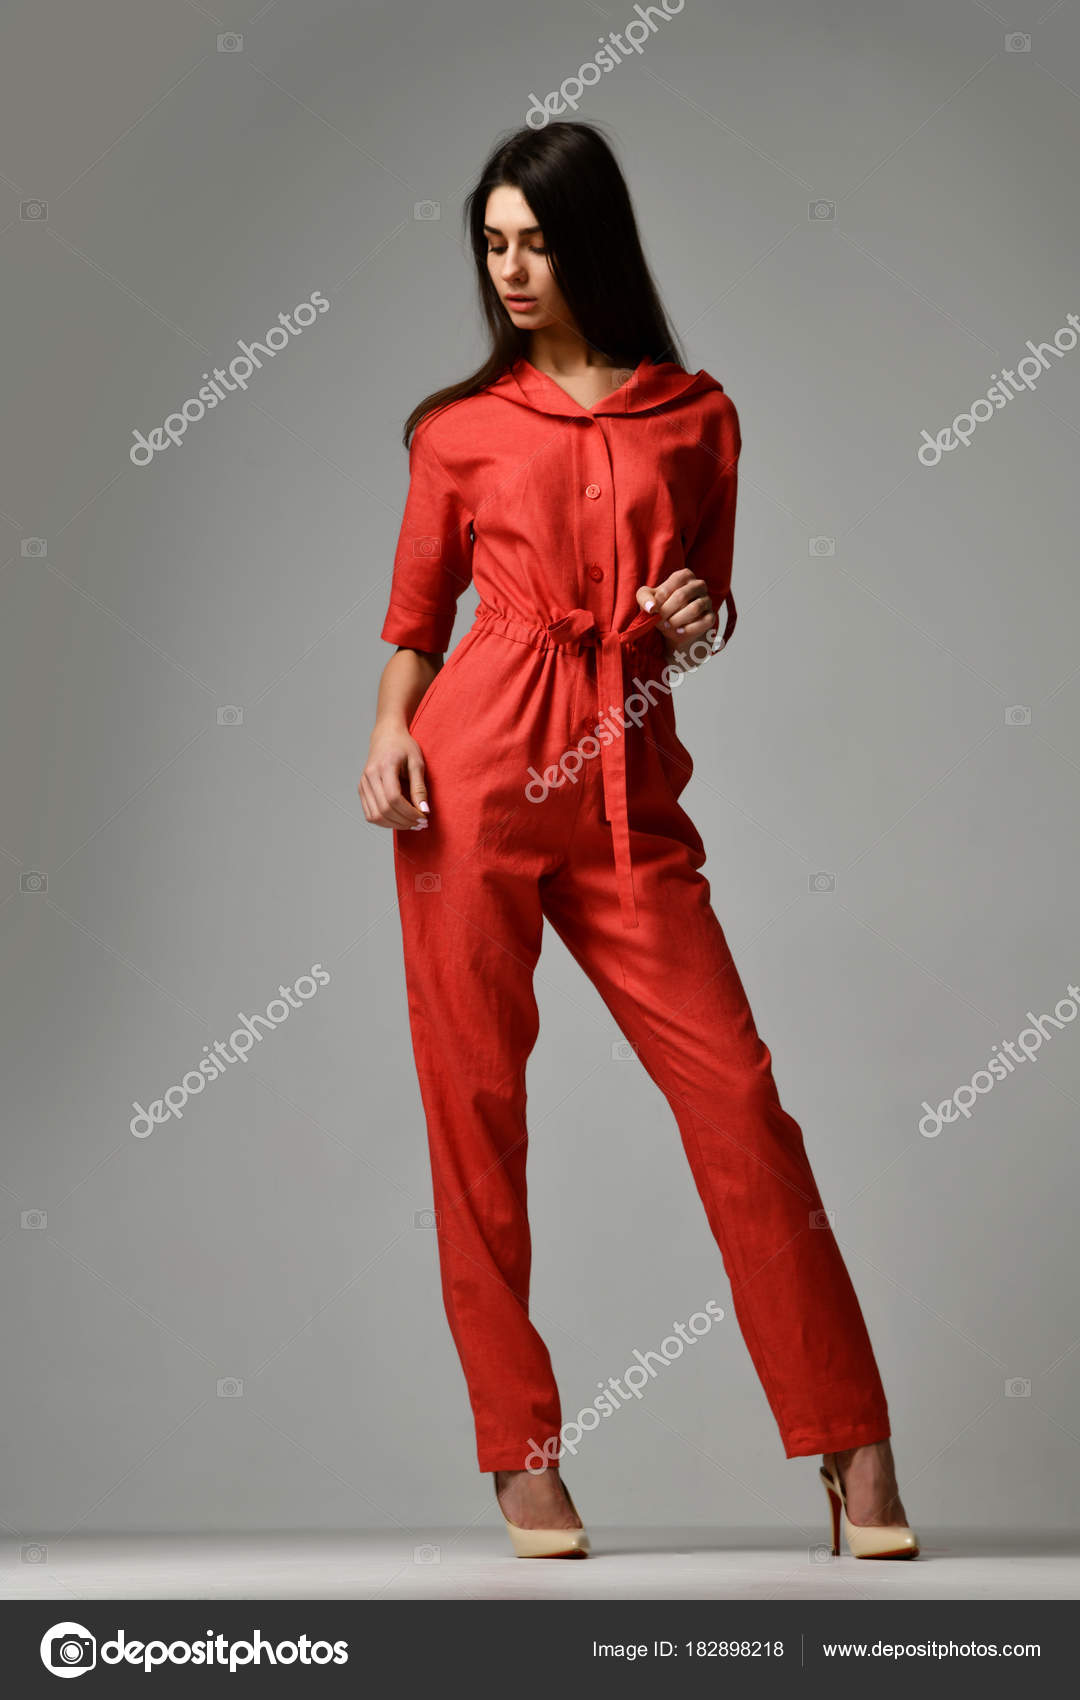 31678e978718 Νεαρή όμορφη γυναίκα που παρουσιάζουν στο νέο casual Μόδα κόκκινο κοστούμι  φόρεμα με παντελόνι και γεμάτο σώμα κουκούλα σε γκρι φόντο — Εικόνα από ...